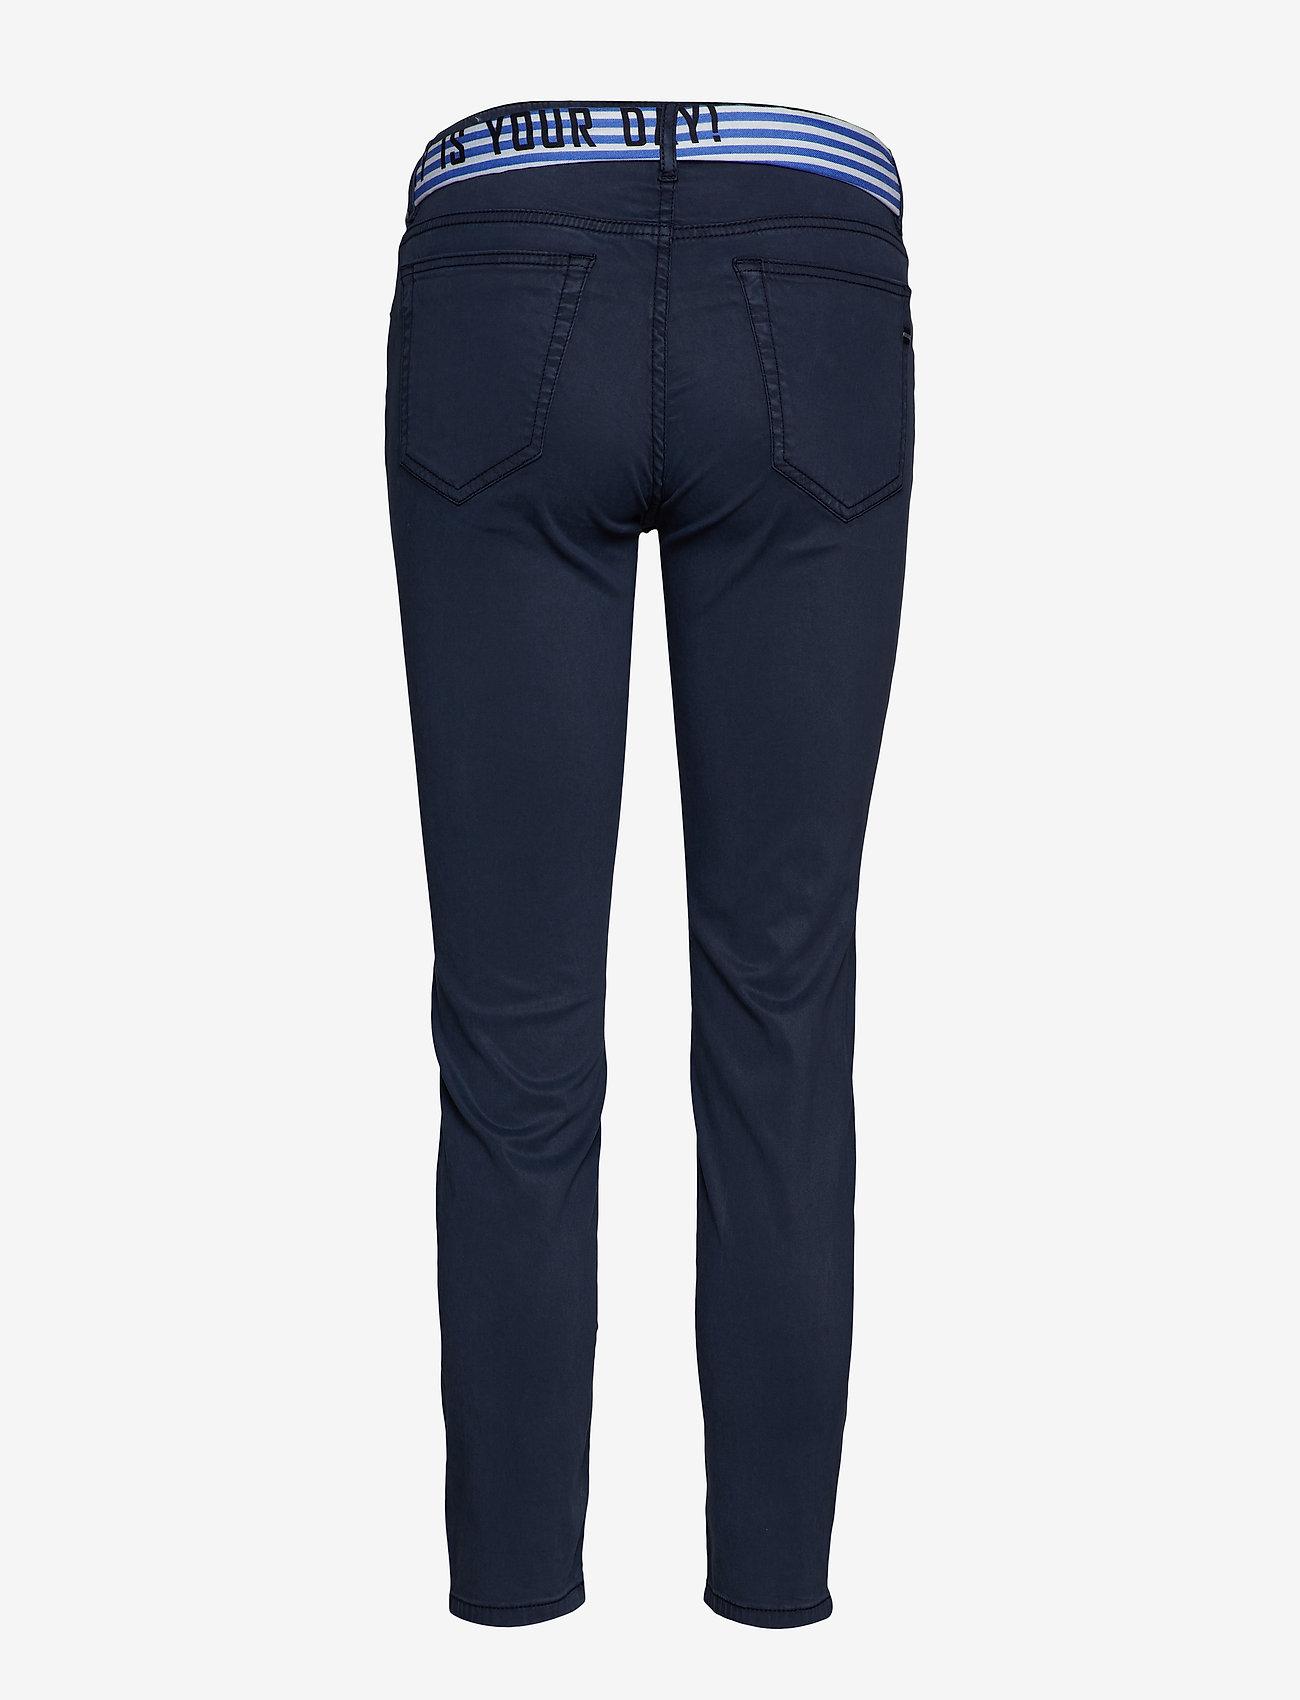 Marc O'Polo - Jeans - skinny jeans - deep atlantic - 1